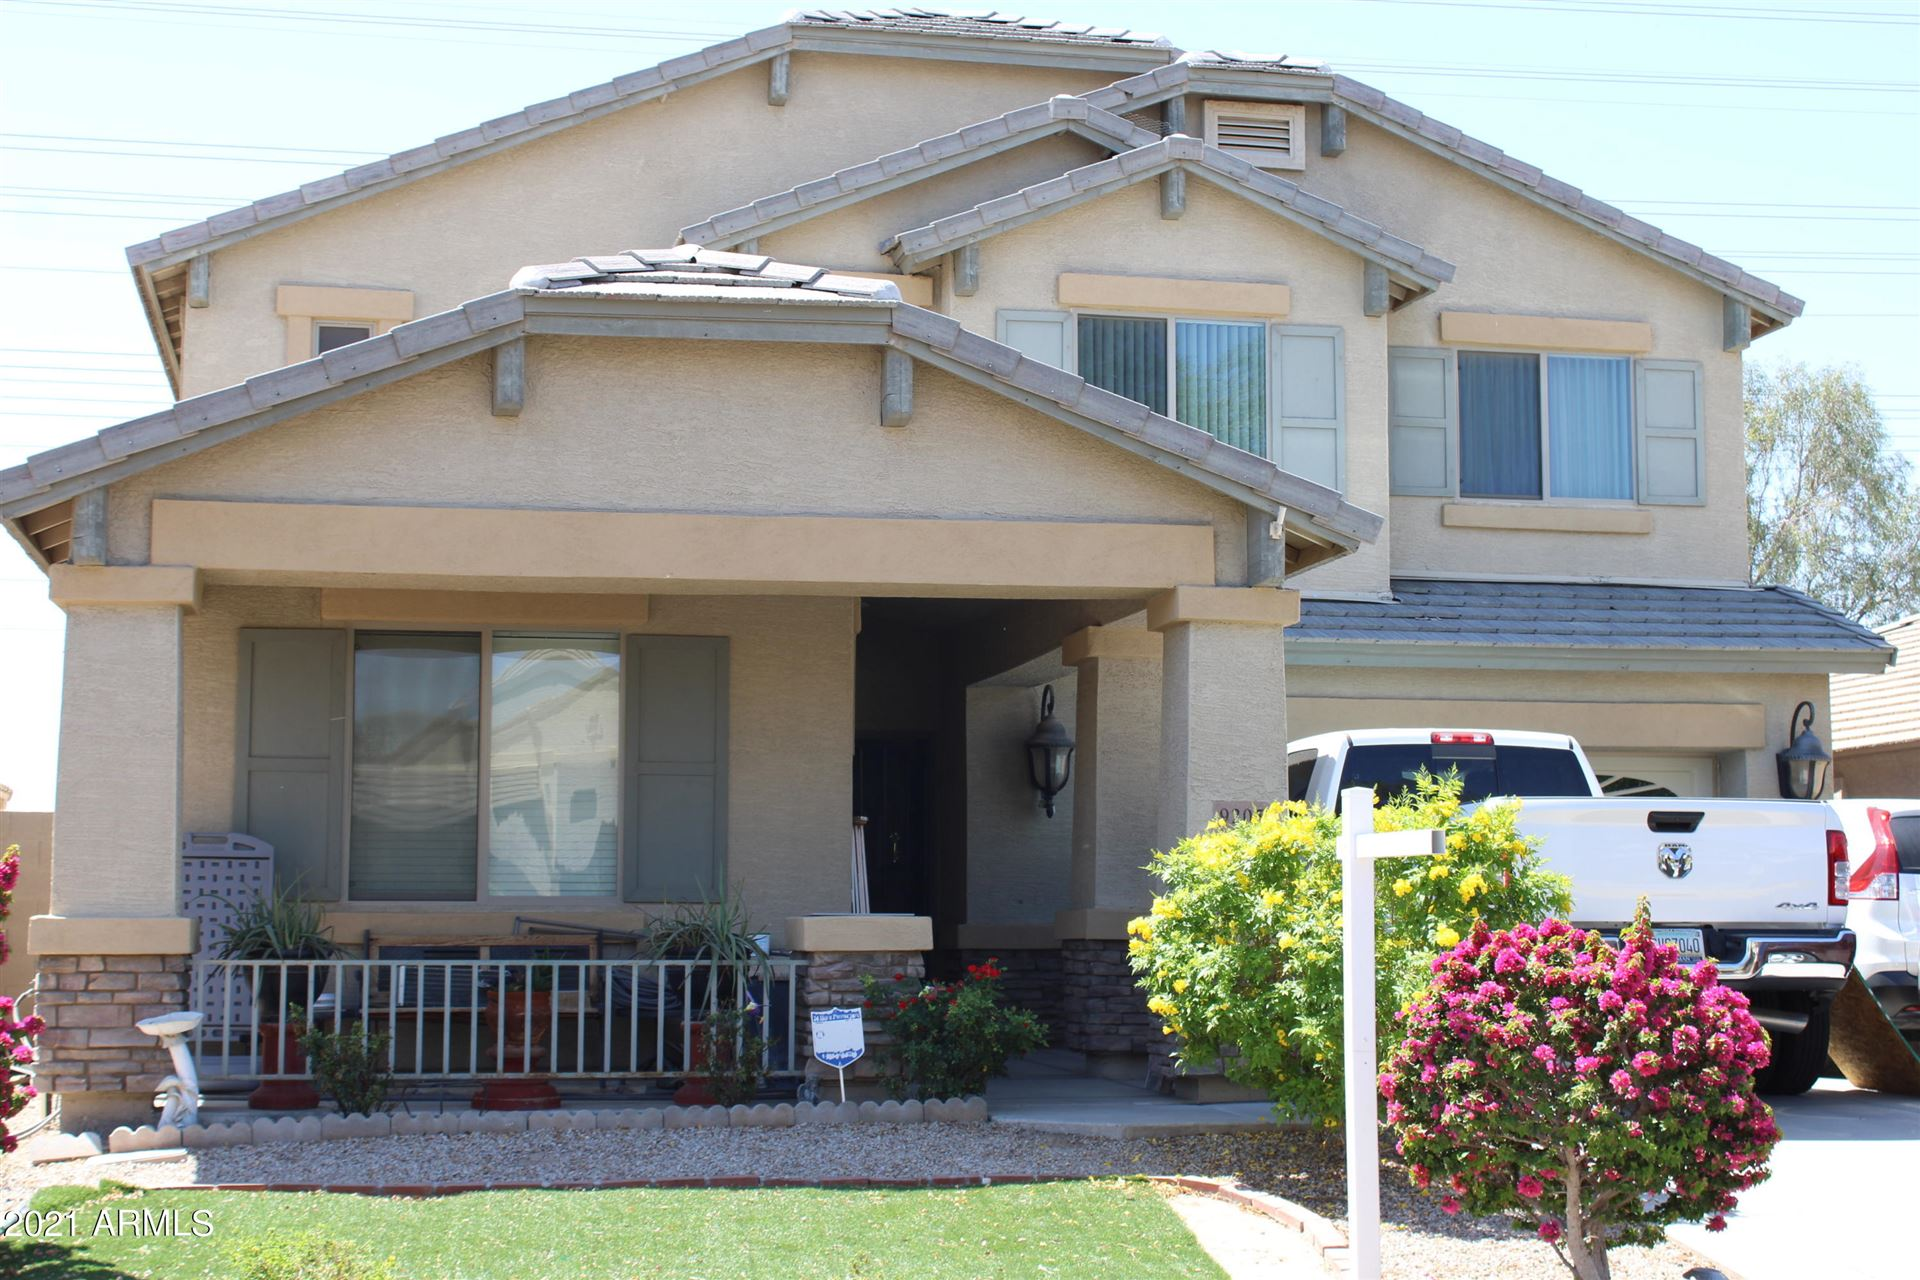 9205 W HEBER Road, Tolleson, AZ 85353 - MLS#: 6224333